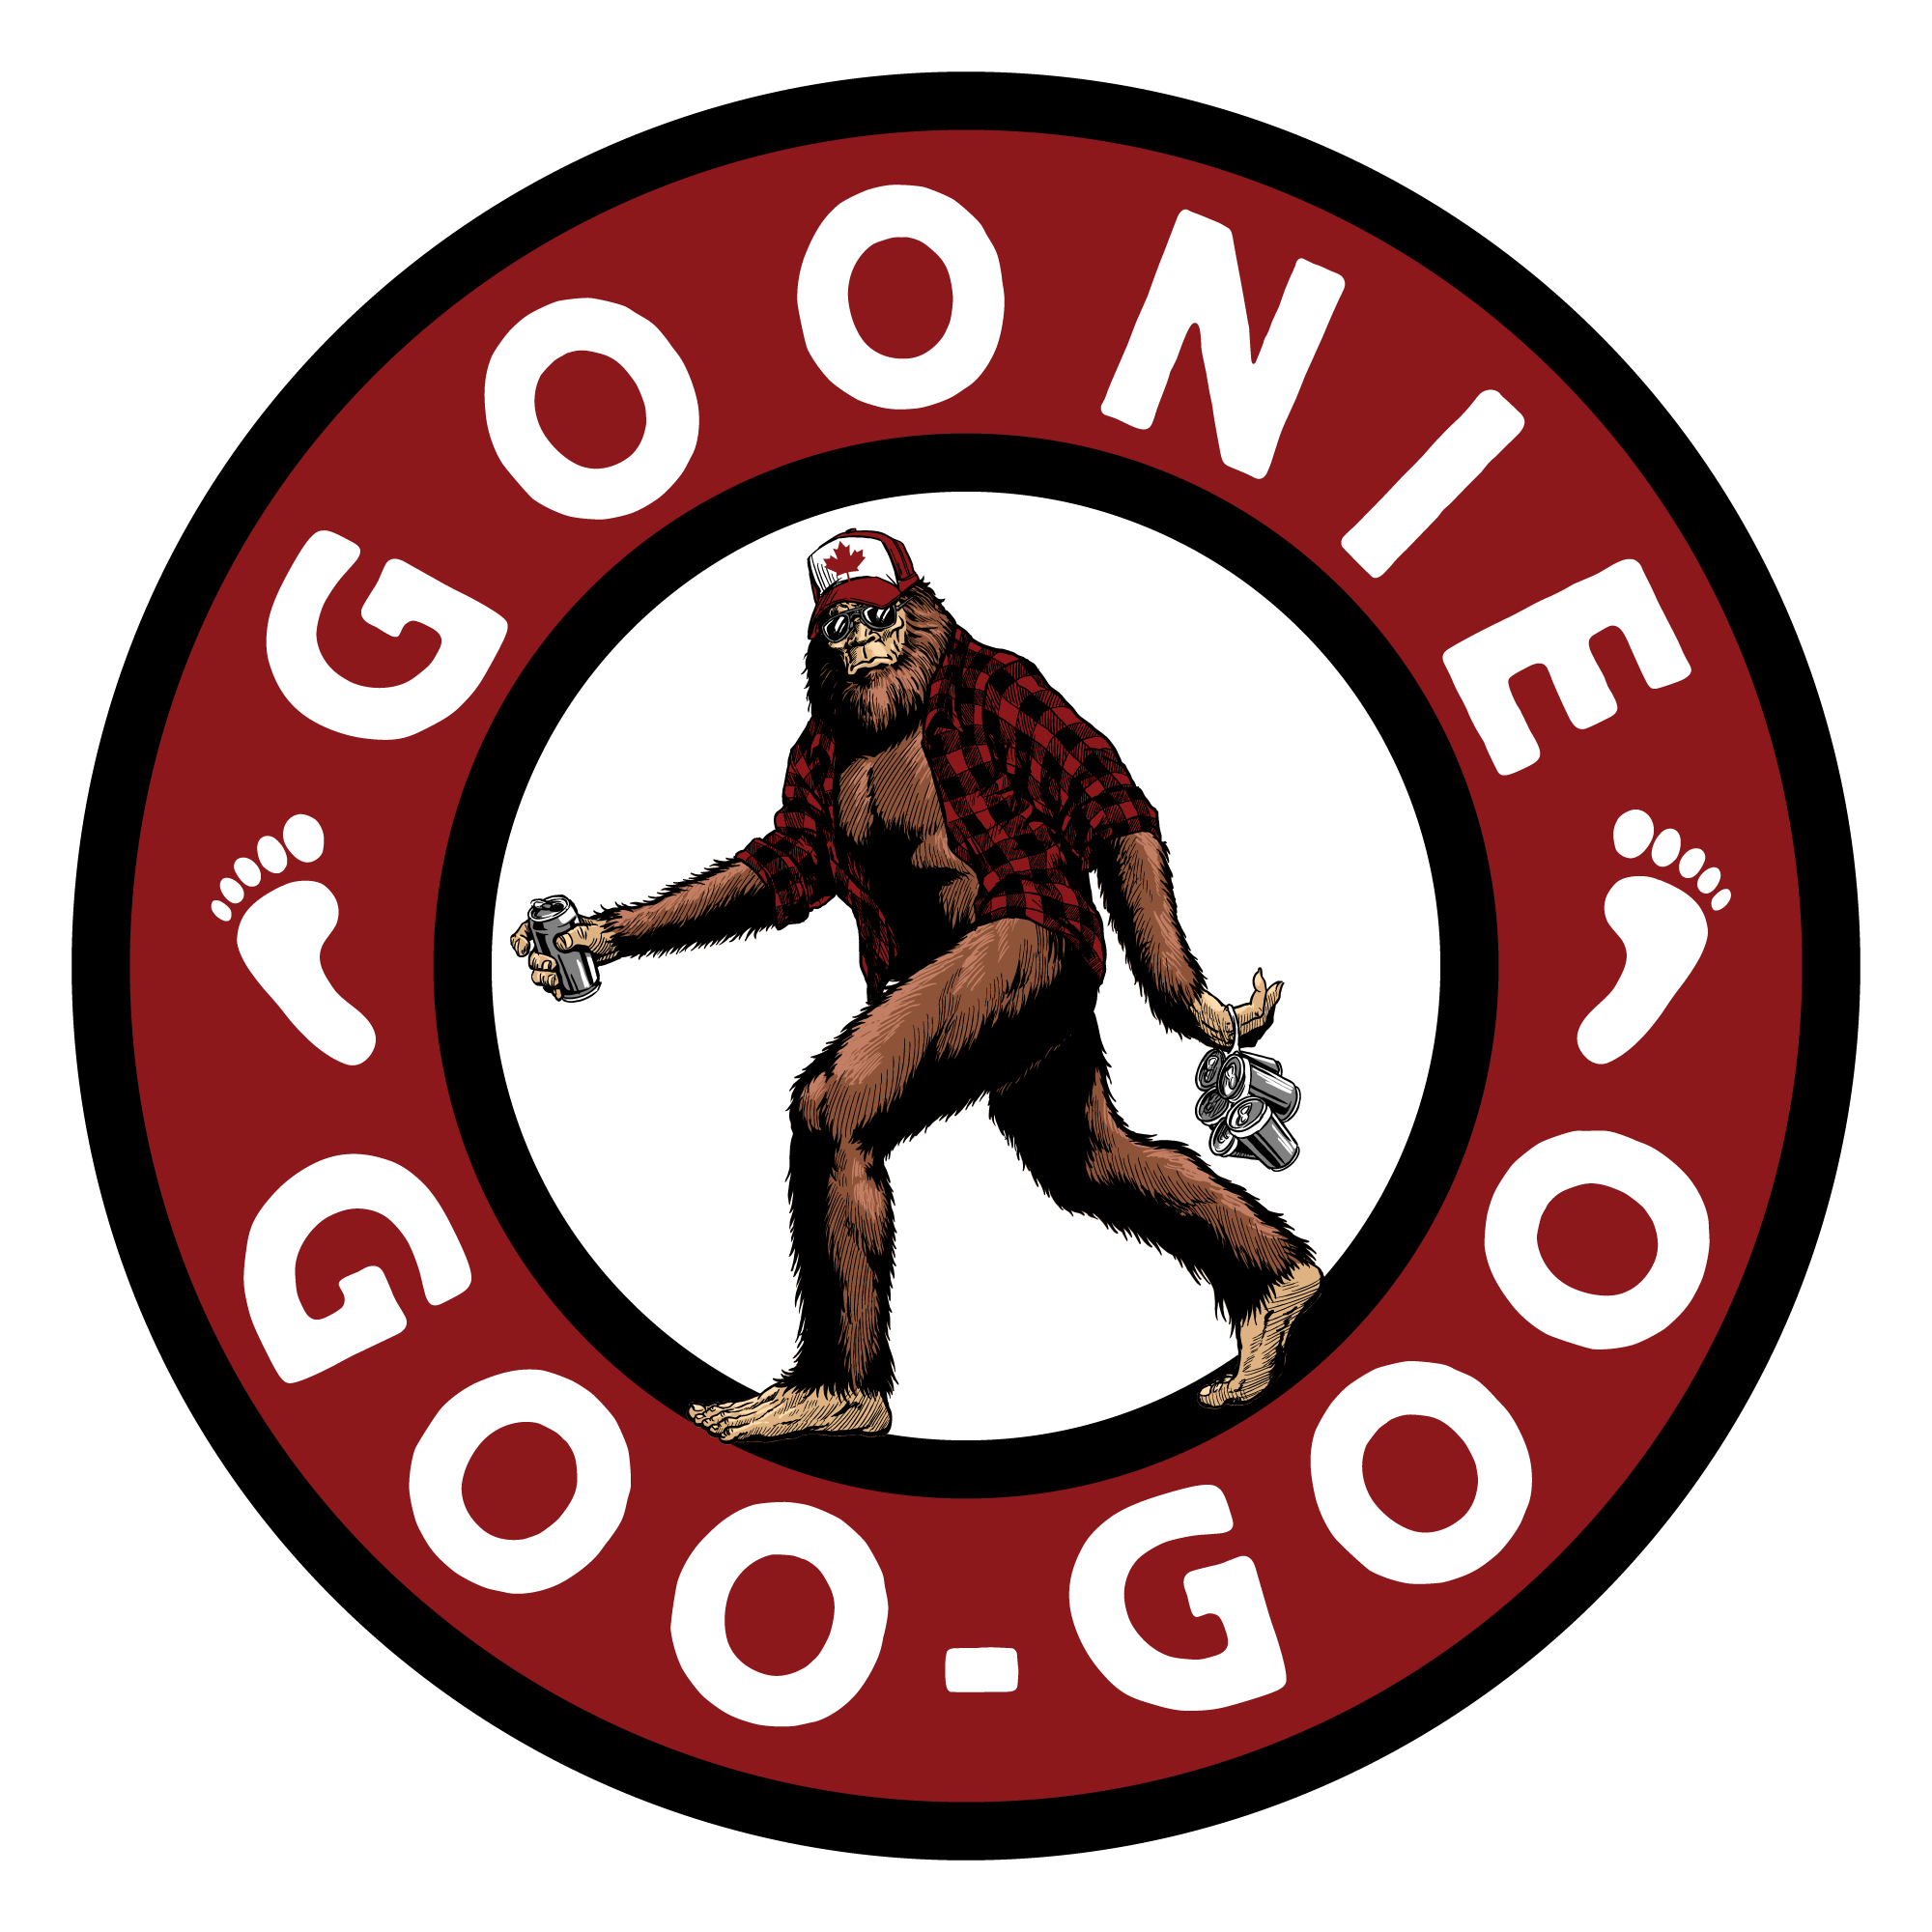 goonie goo-goo productions